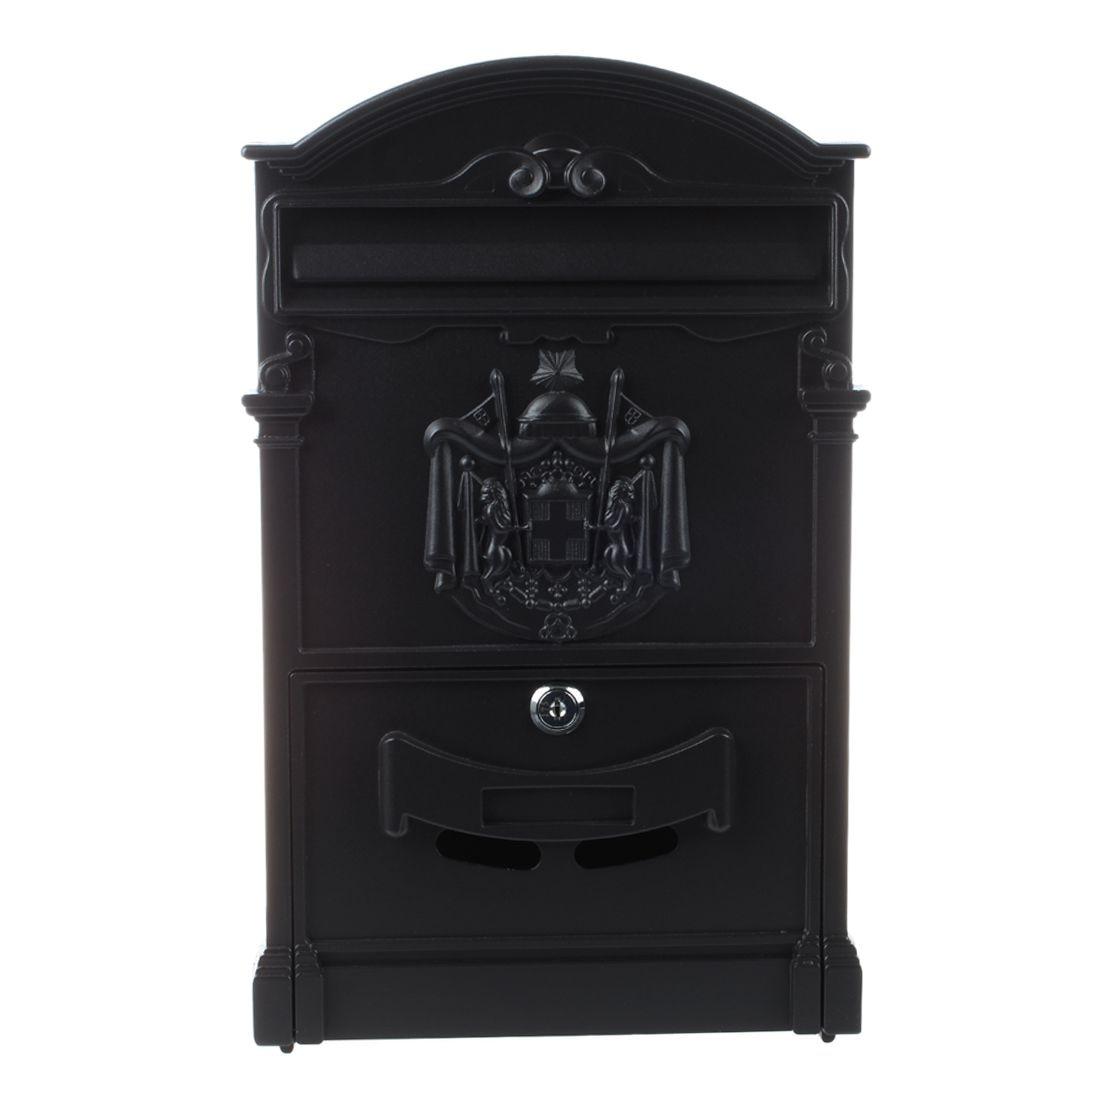 New Heavy Duty Black Aluminium Lockable Secure Mail Letter Post Box Letterbox New